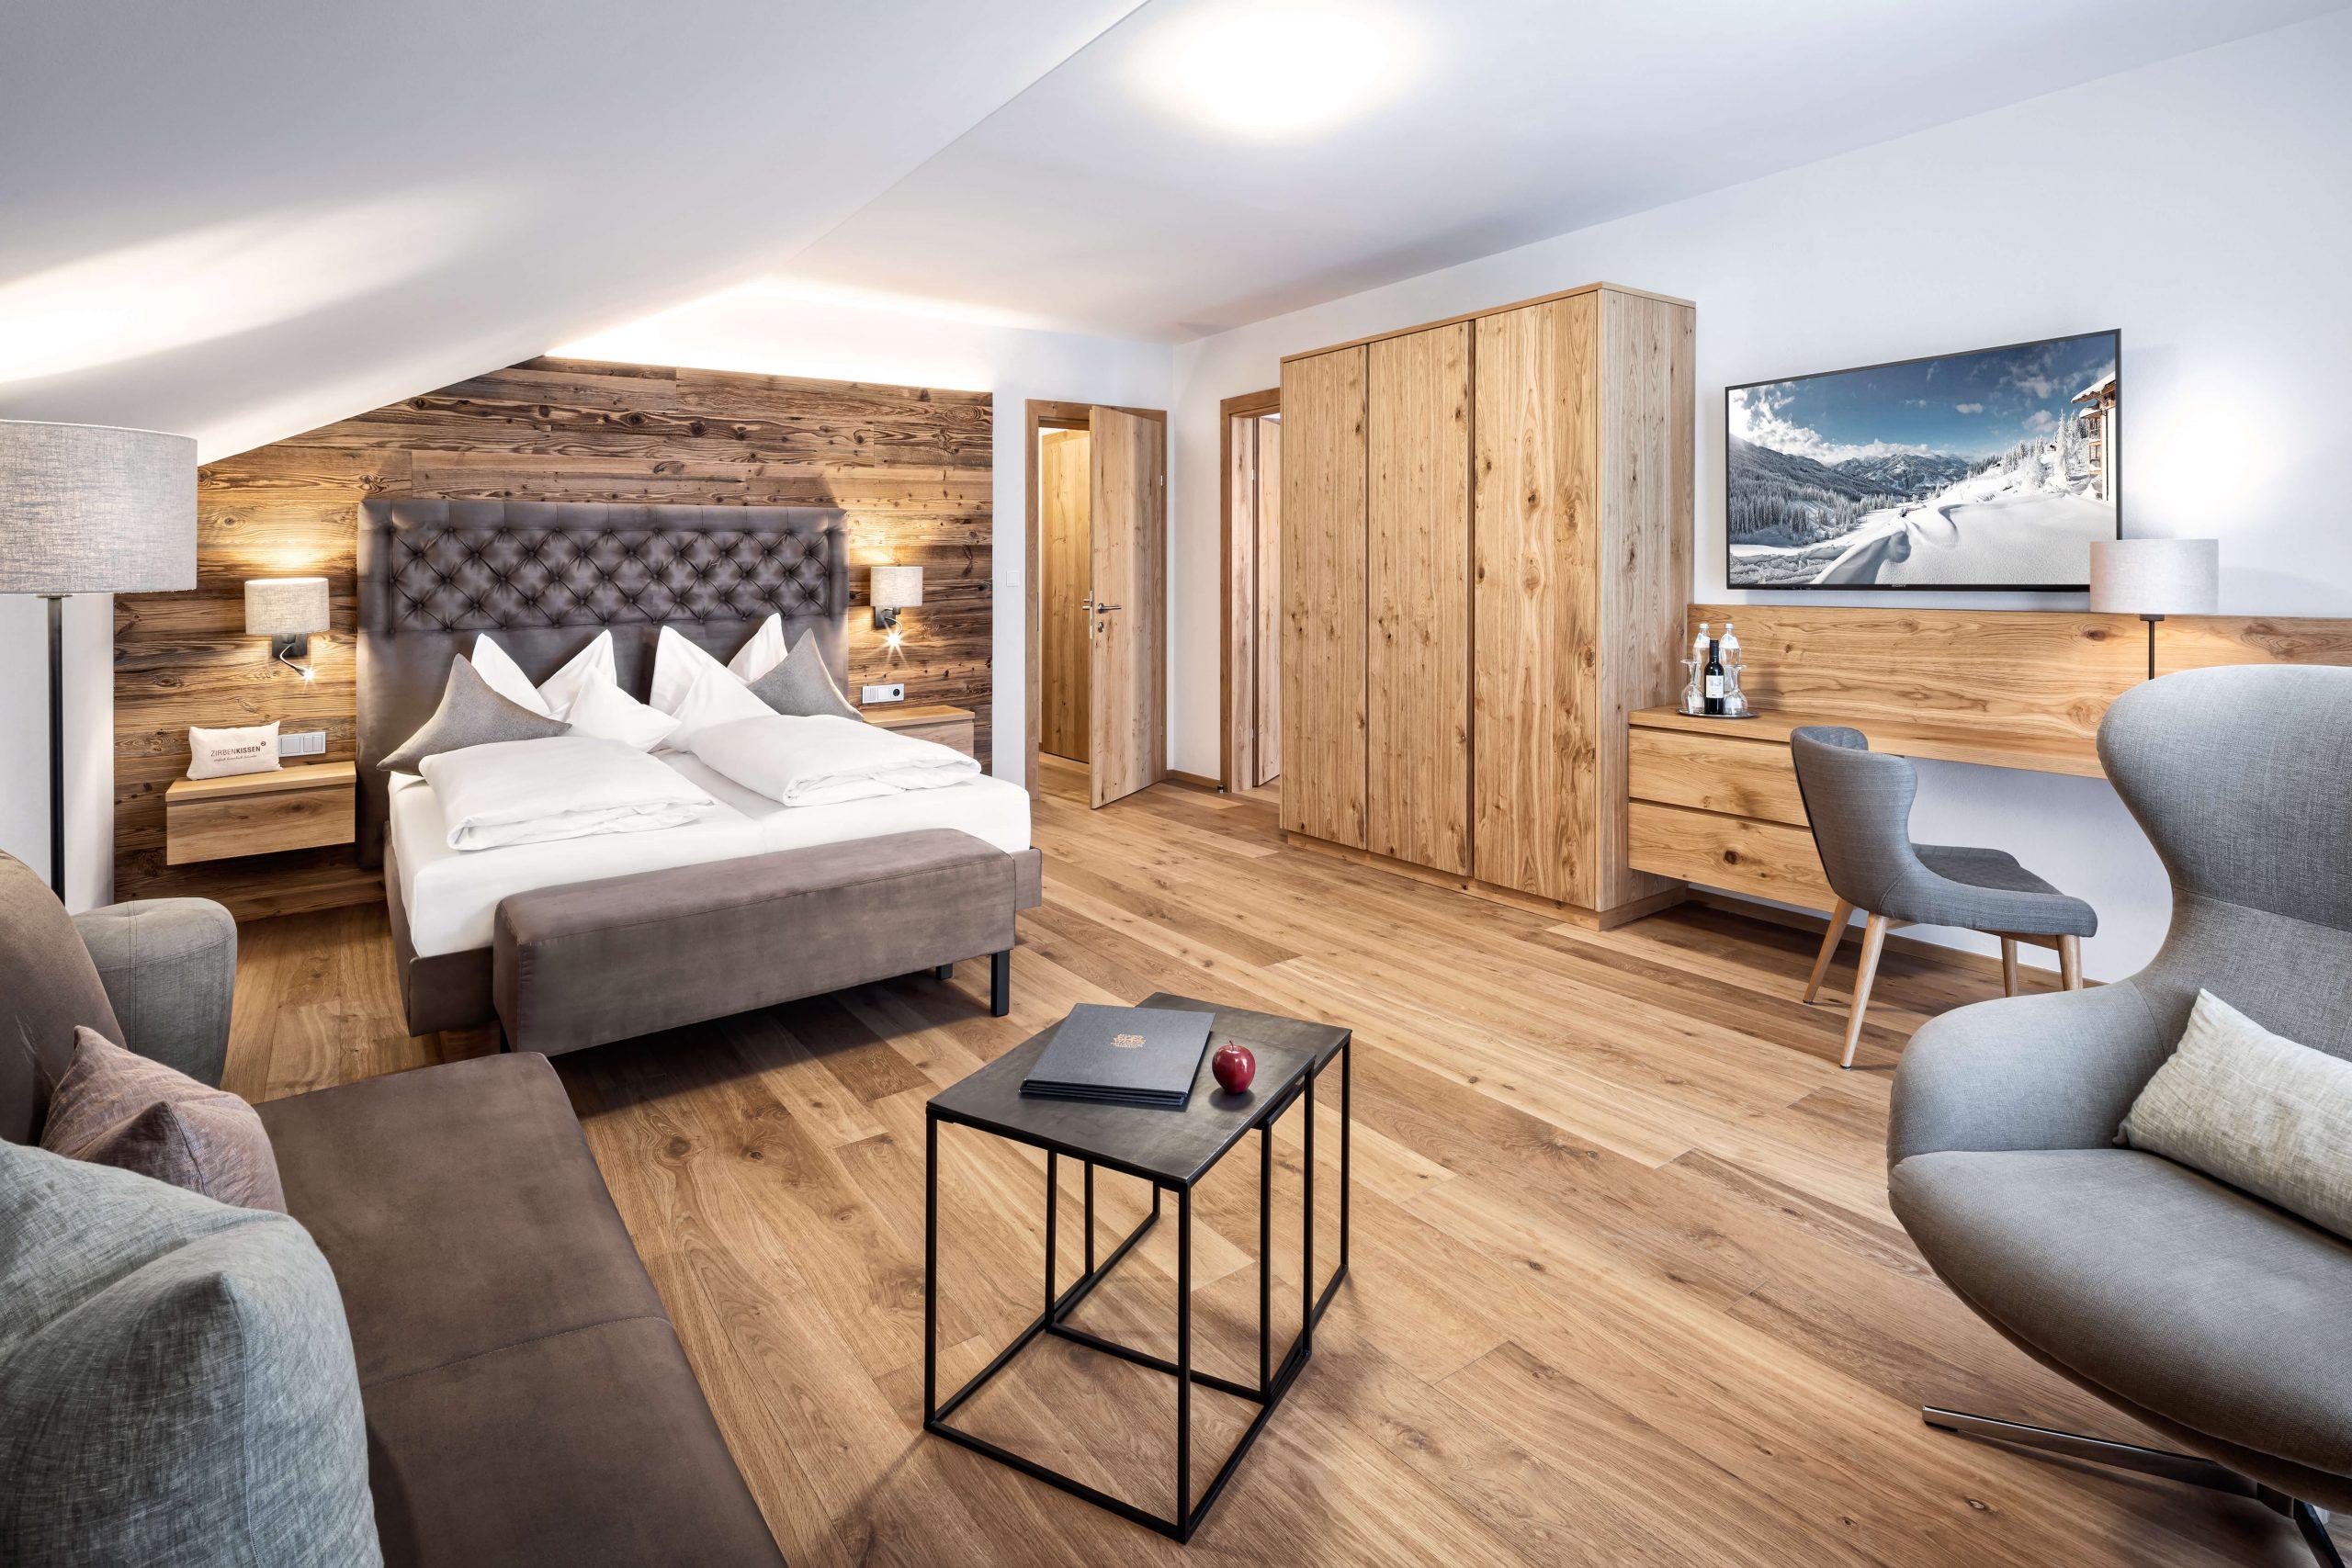 Suite XL Sternenklar im Naturidyll Hotel Edelweiss Wagrain